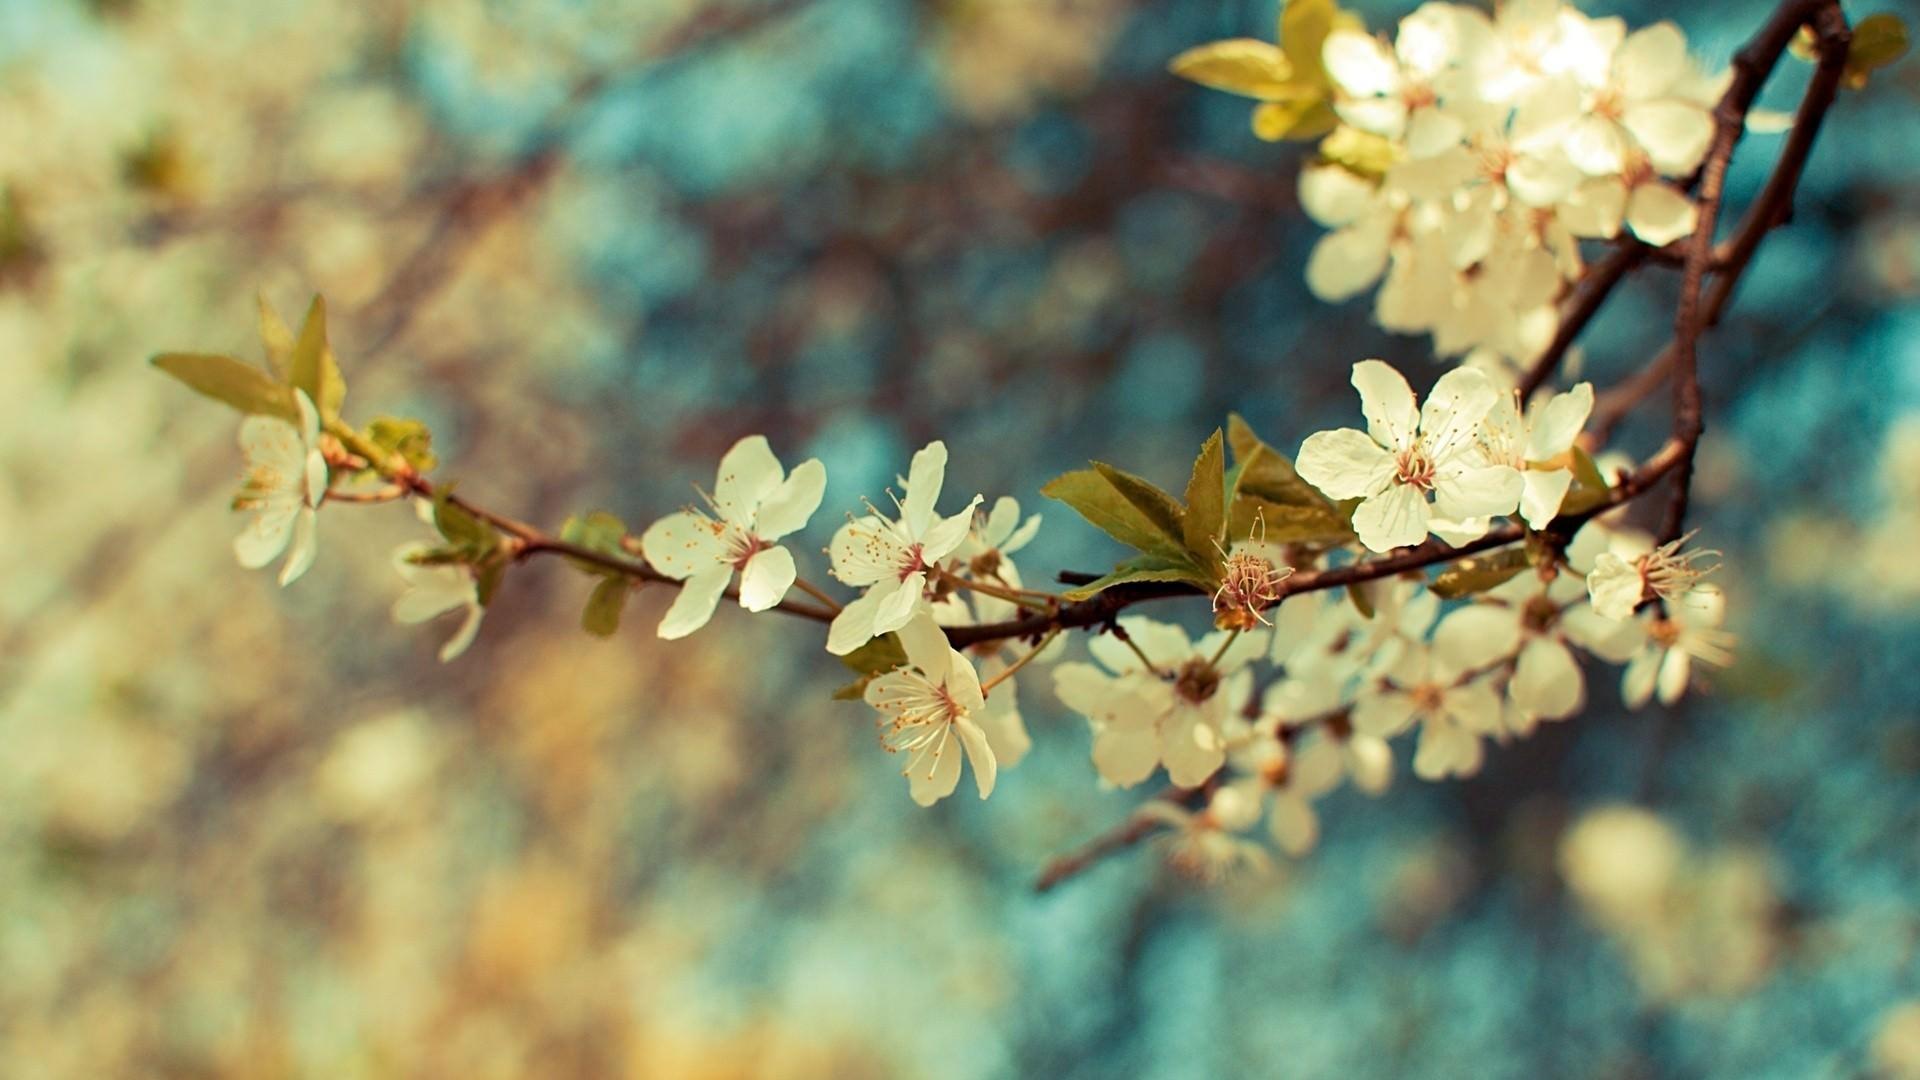 Vintage Flower Photography Wallpaper